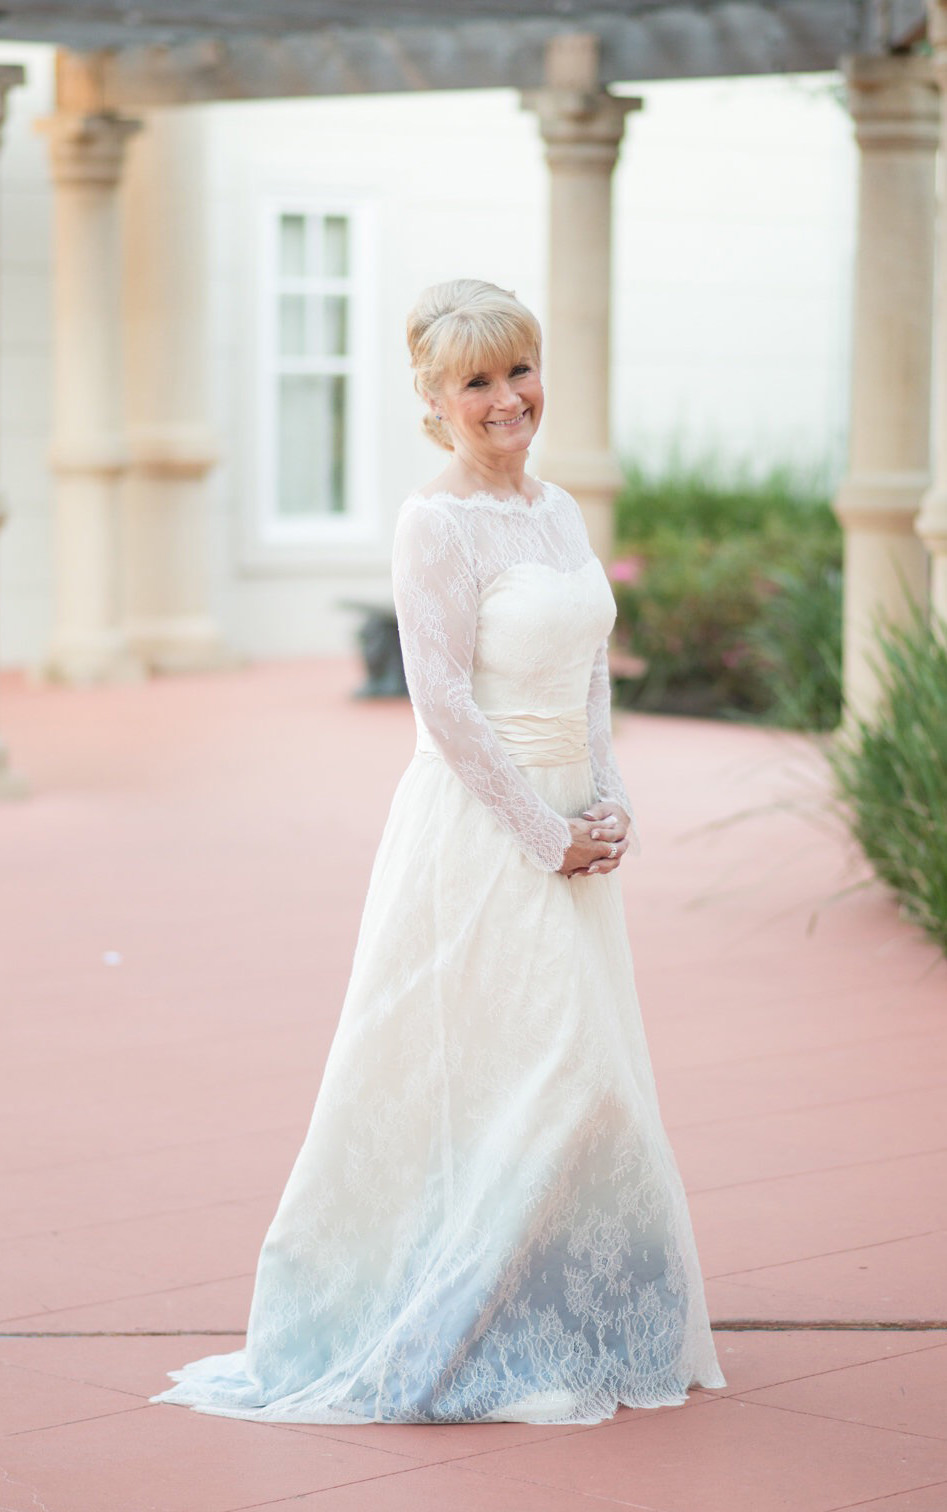 90 - ombre custom bridal gown short dress jumpsuit houston online color wedding dresses.jpg